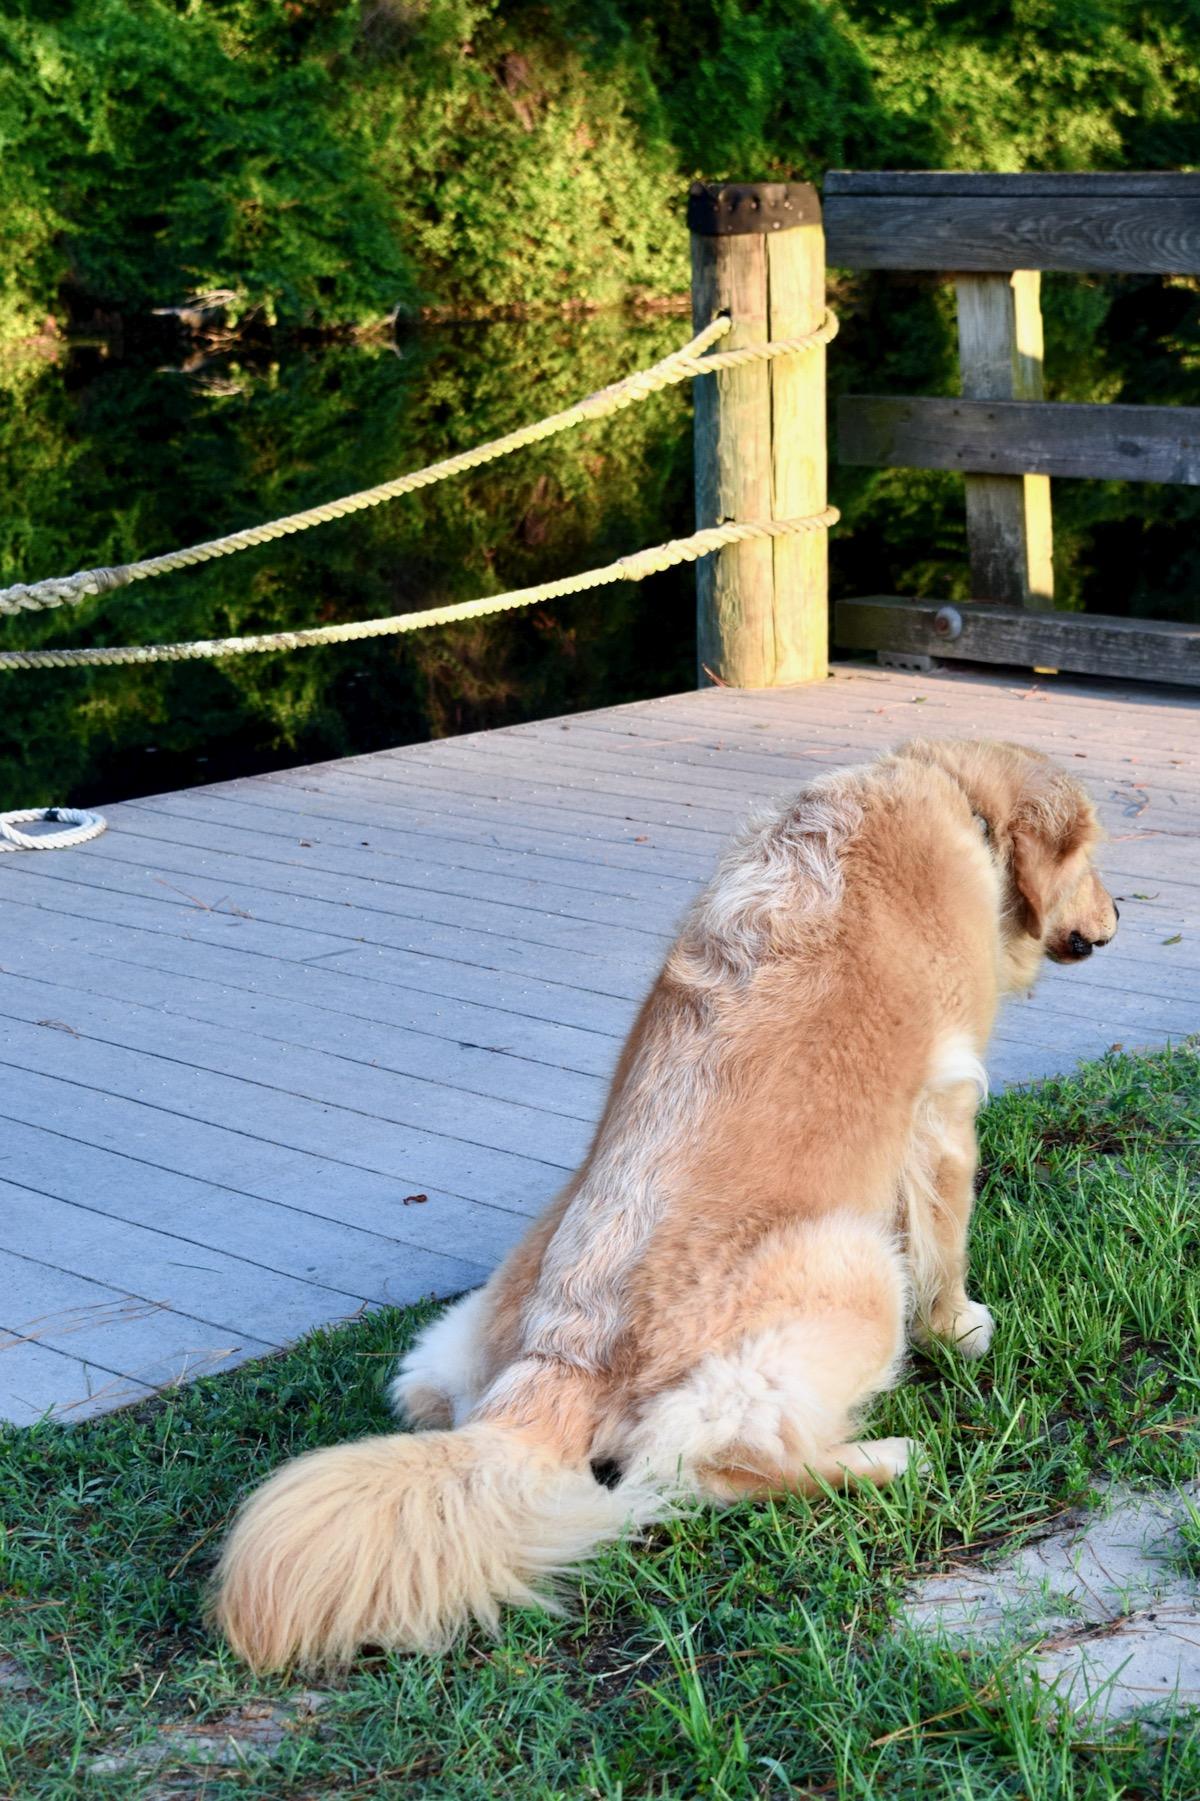 Avoiding dog disasters in rough seas (golden retriever pees on grass beside a dock)